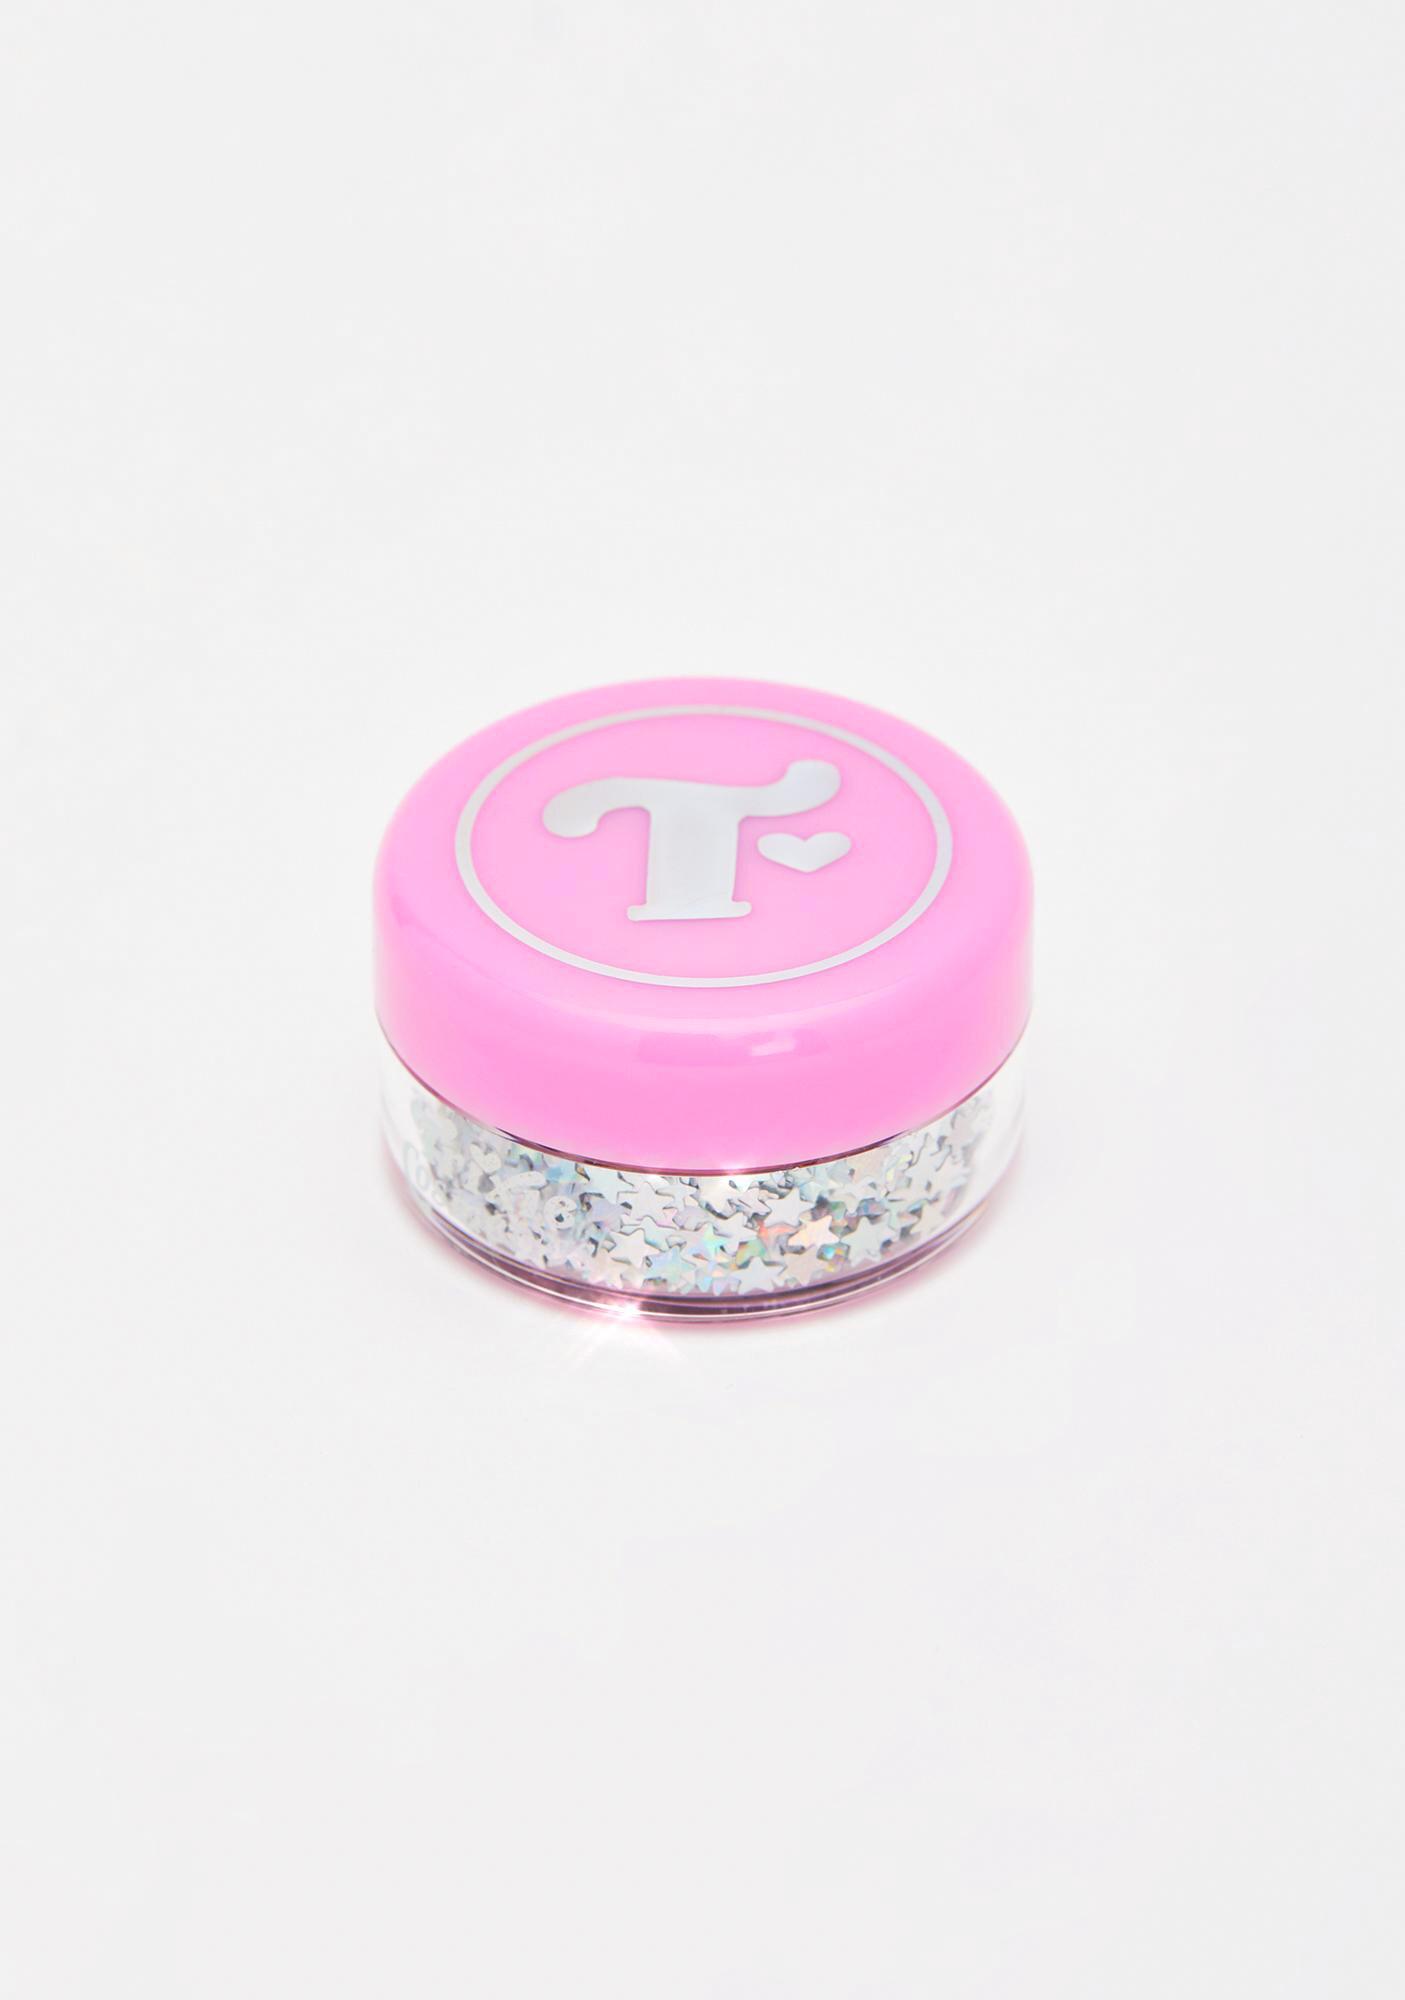 Trixie Cosmetics Pentagram Sprinkles Loose Glitter